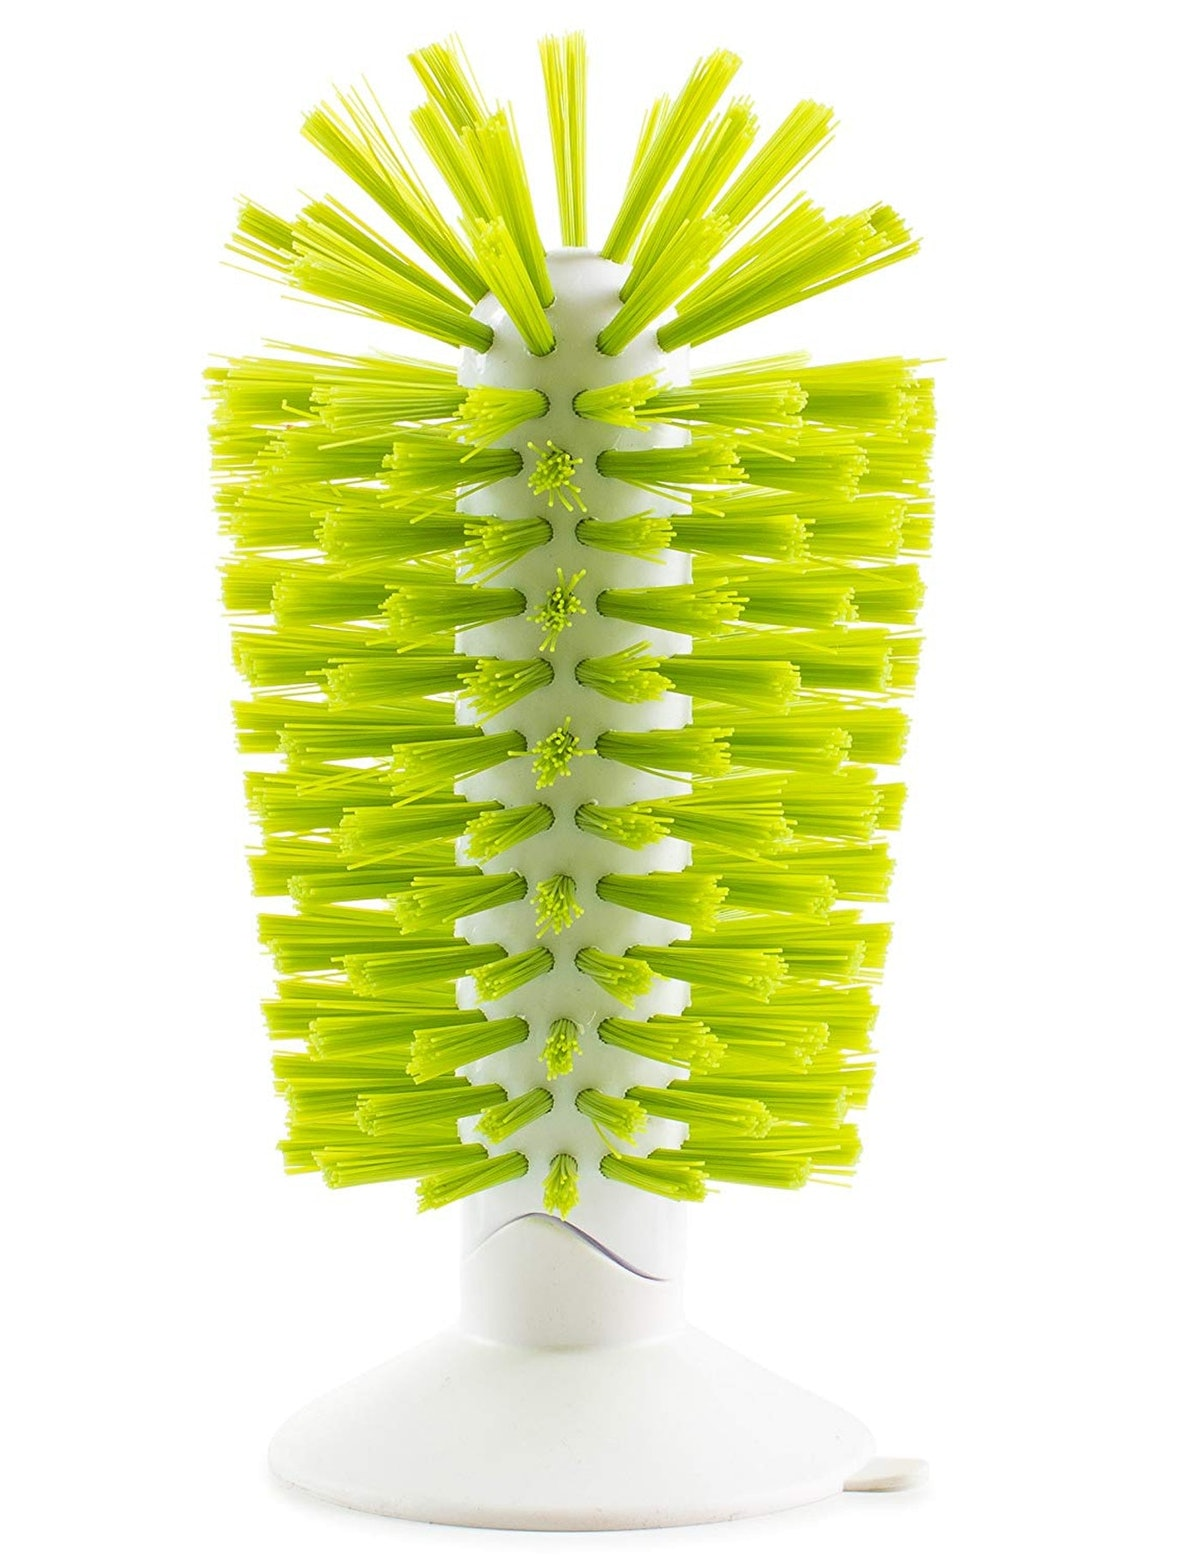 Lemonade kitchenwares Glass Cleaning Brush